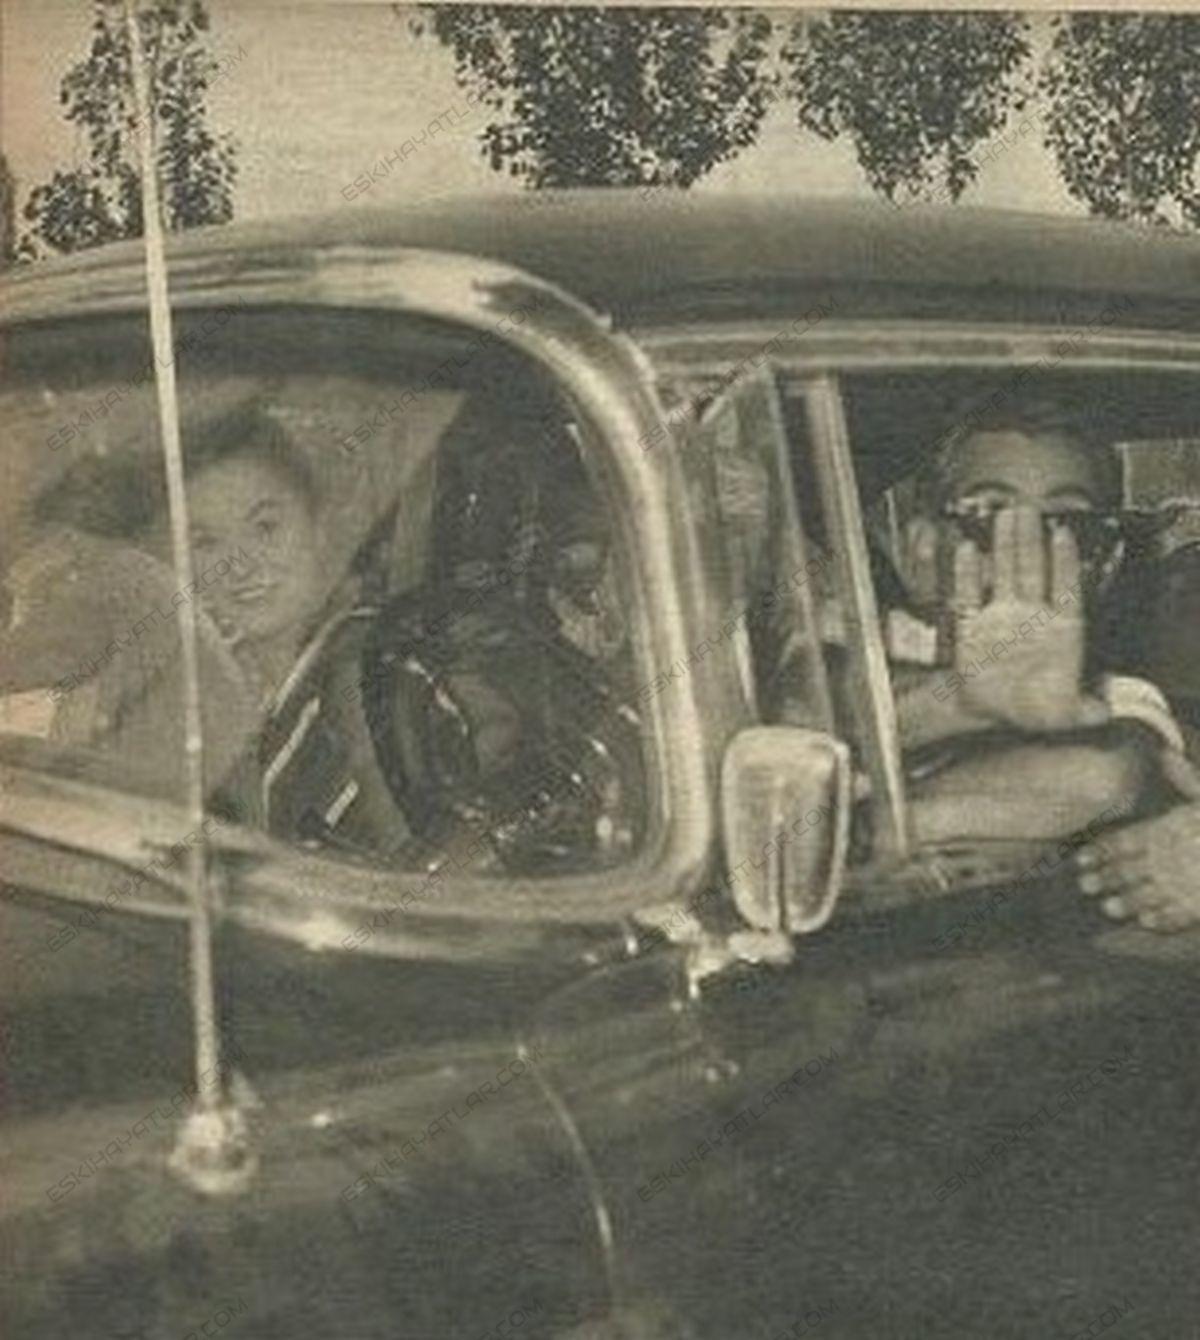 0371-semra-sar-kimdir-semra-sar-fotograflari-1964-ses-dergisi-arsivleri (3)